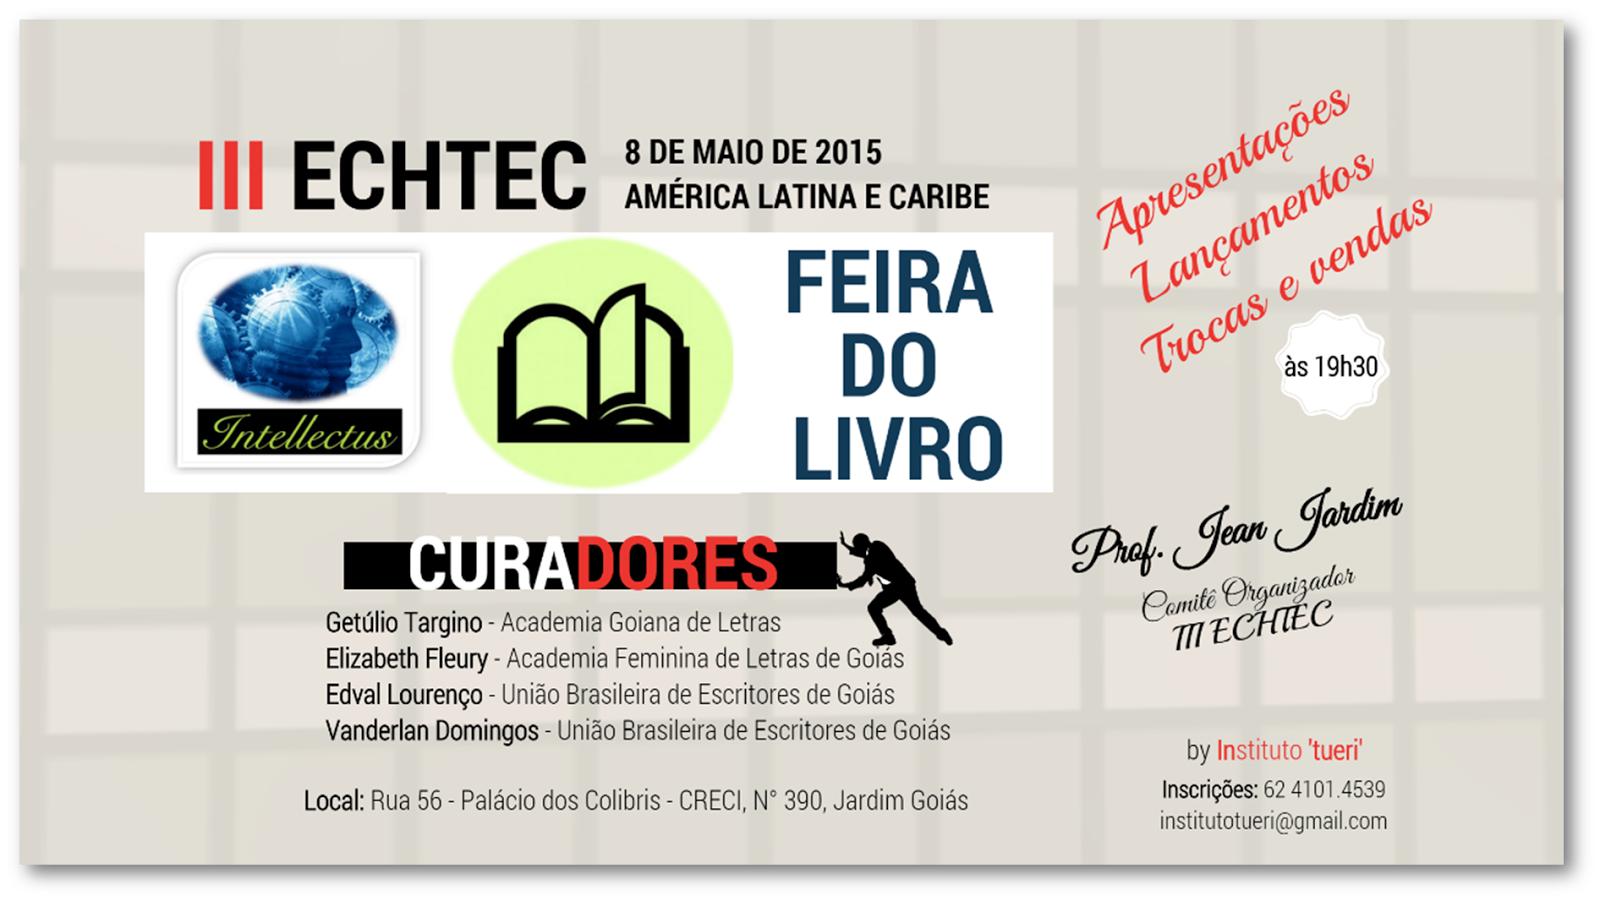 FEIRA DO LIVRO - III ECHTEC 2015